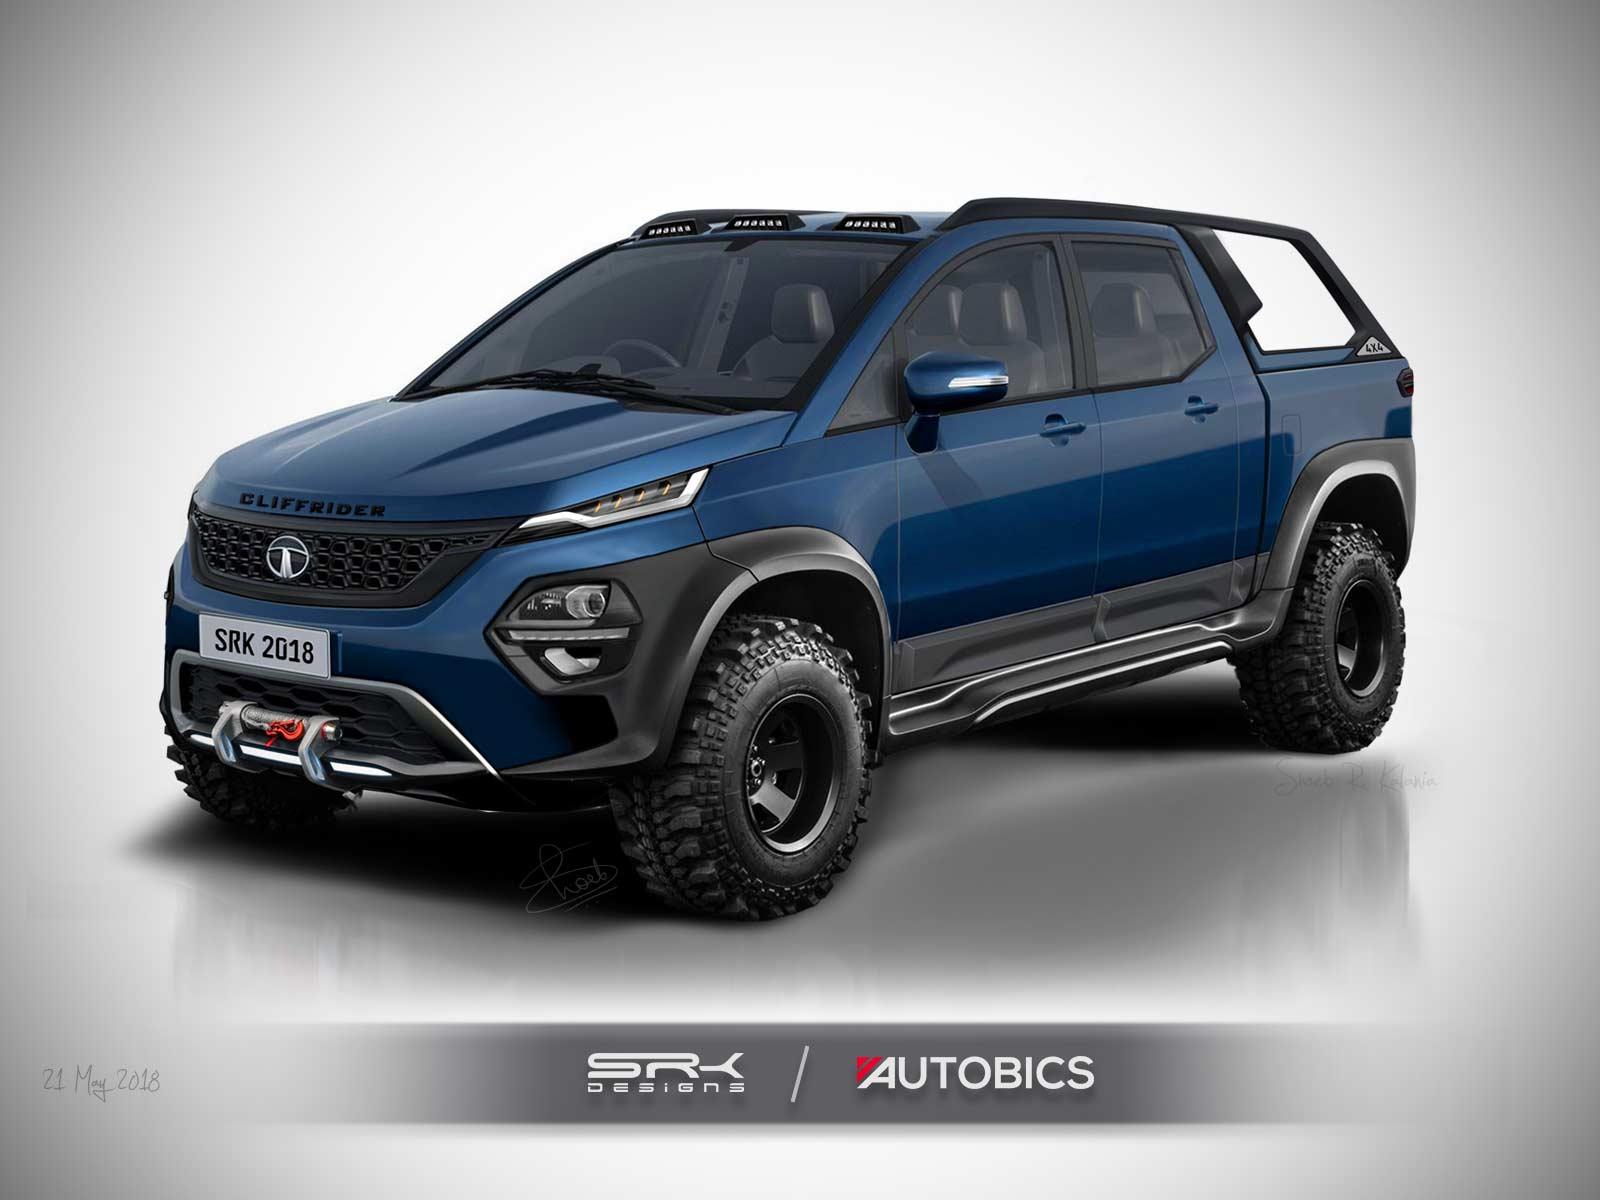 Tata Hexa Cliffrider Concept Rendering 2018 Autobics